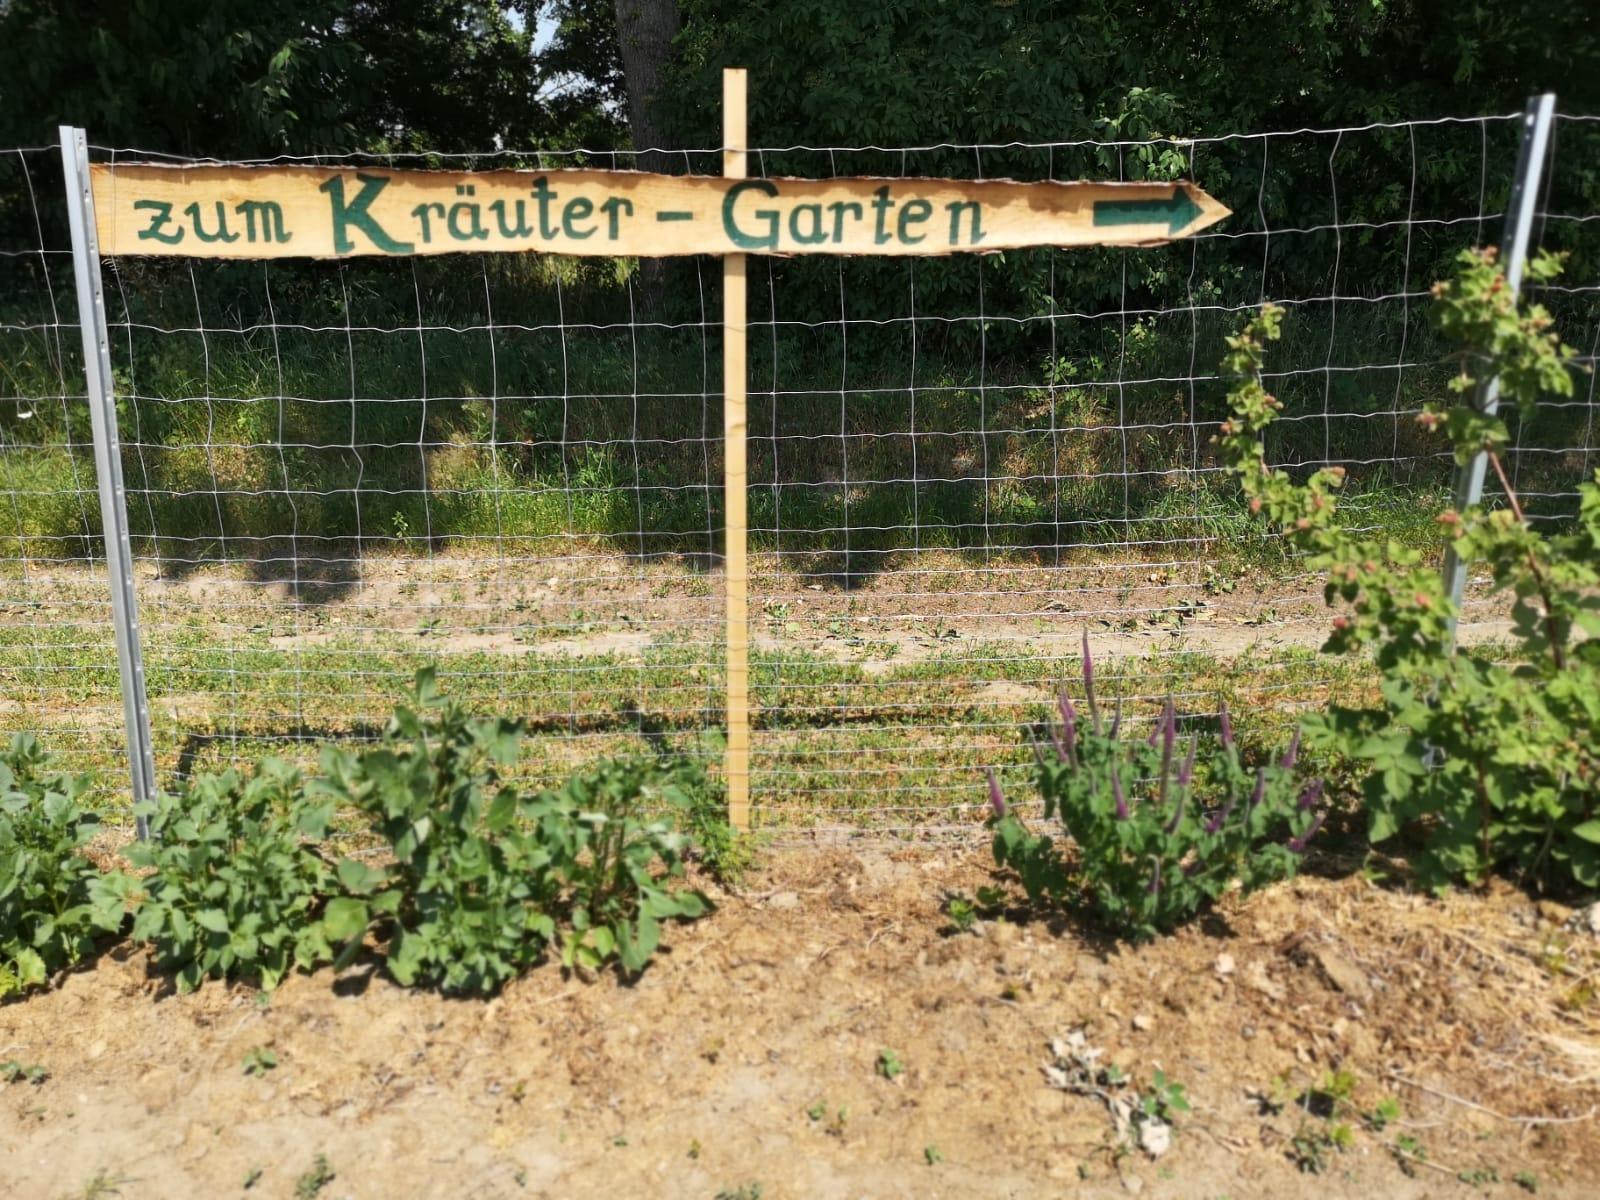 Wegweiser zum Kräutergarten